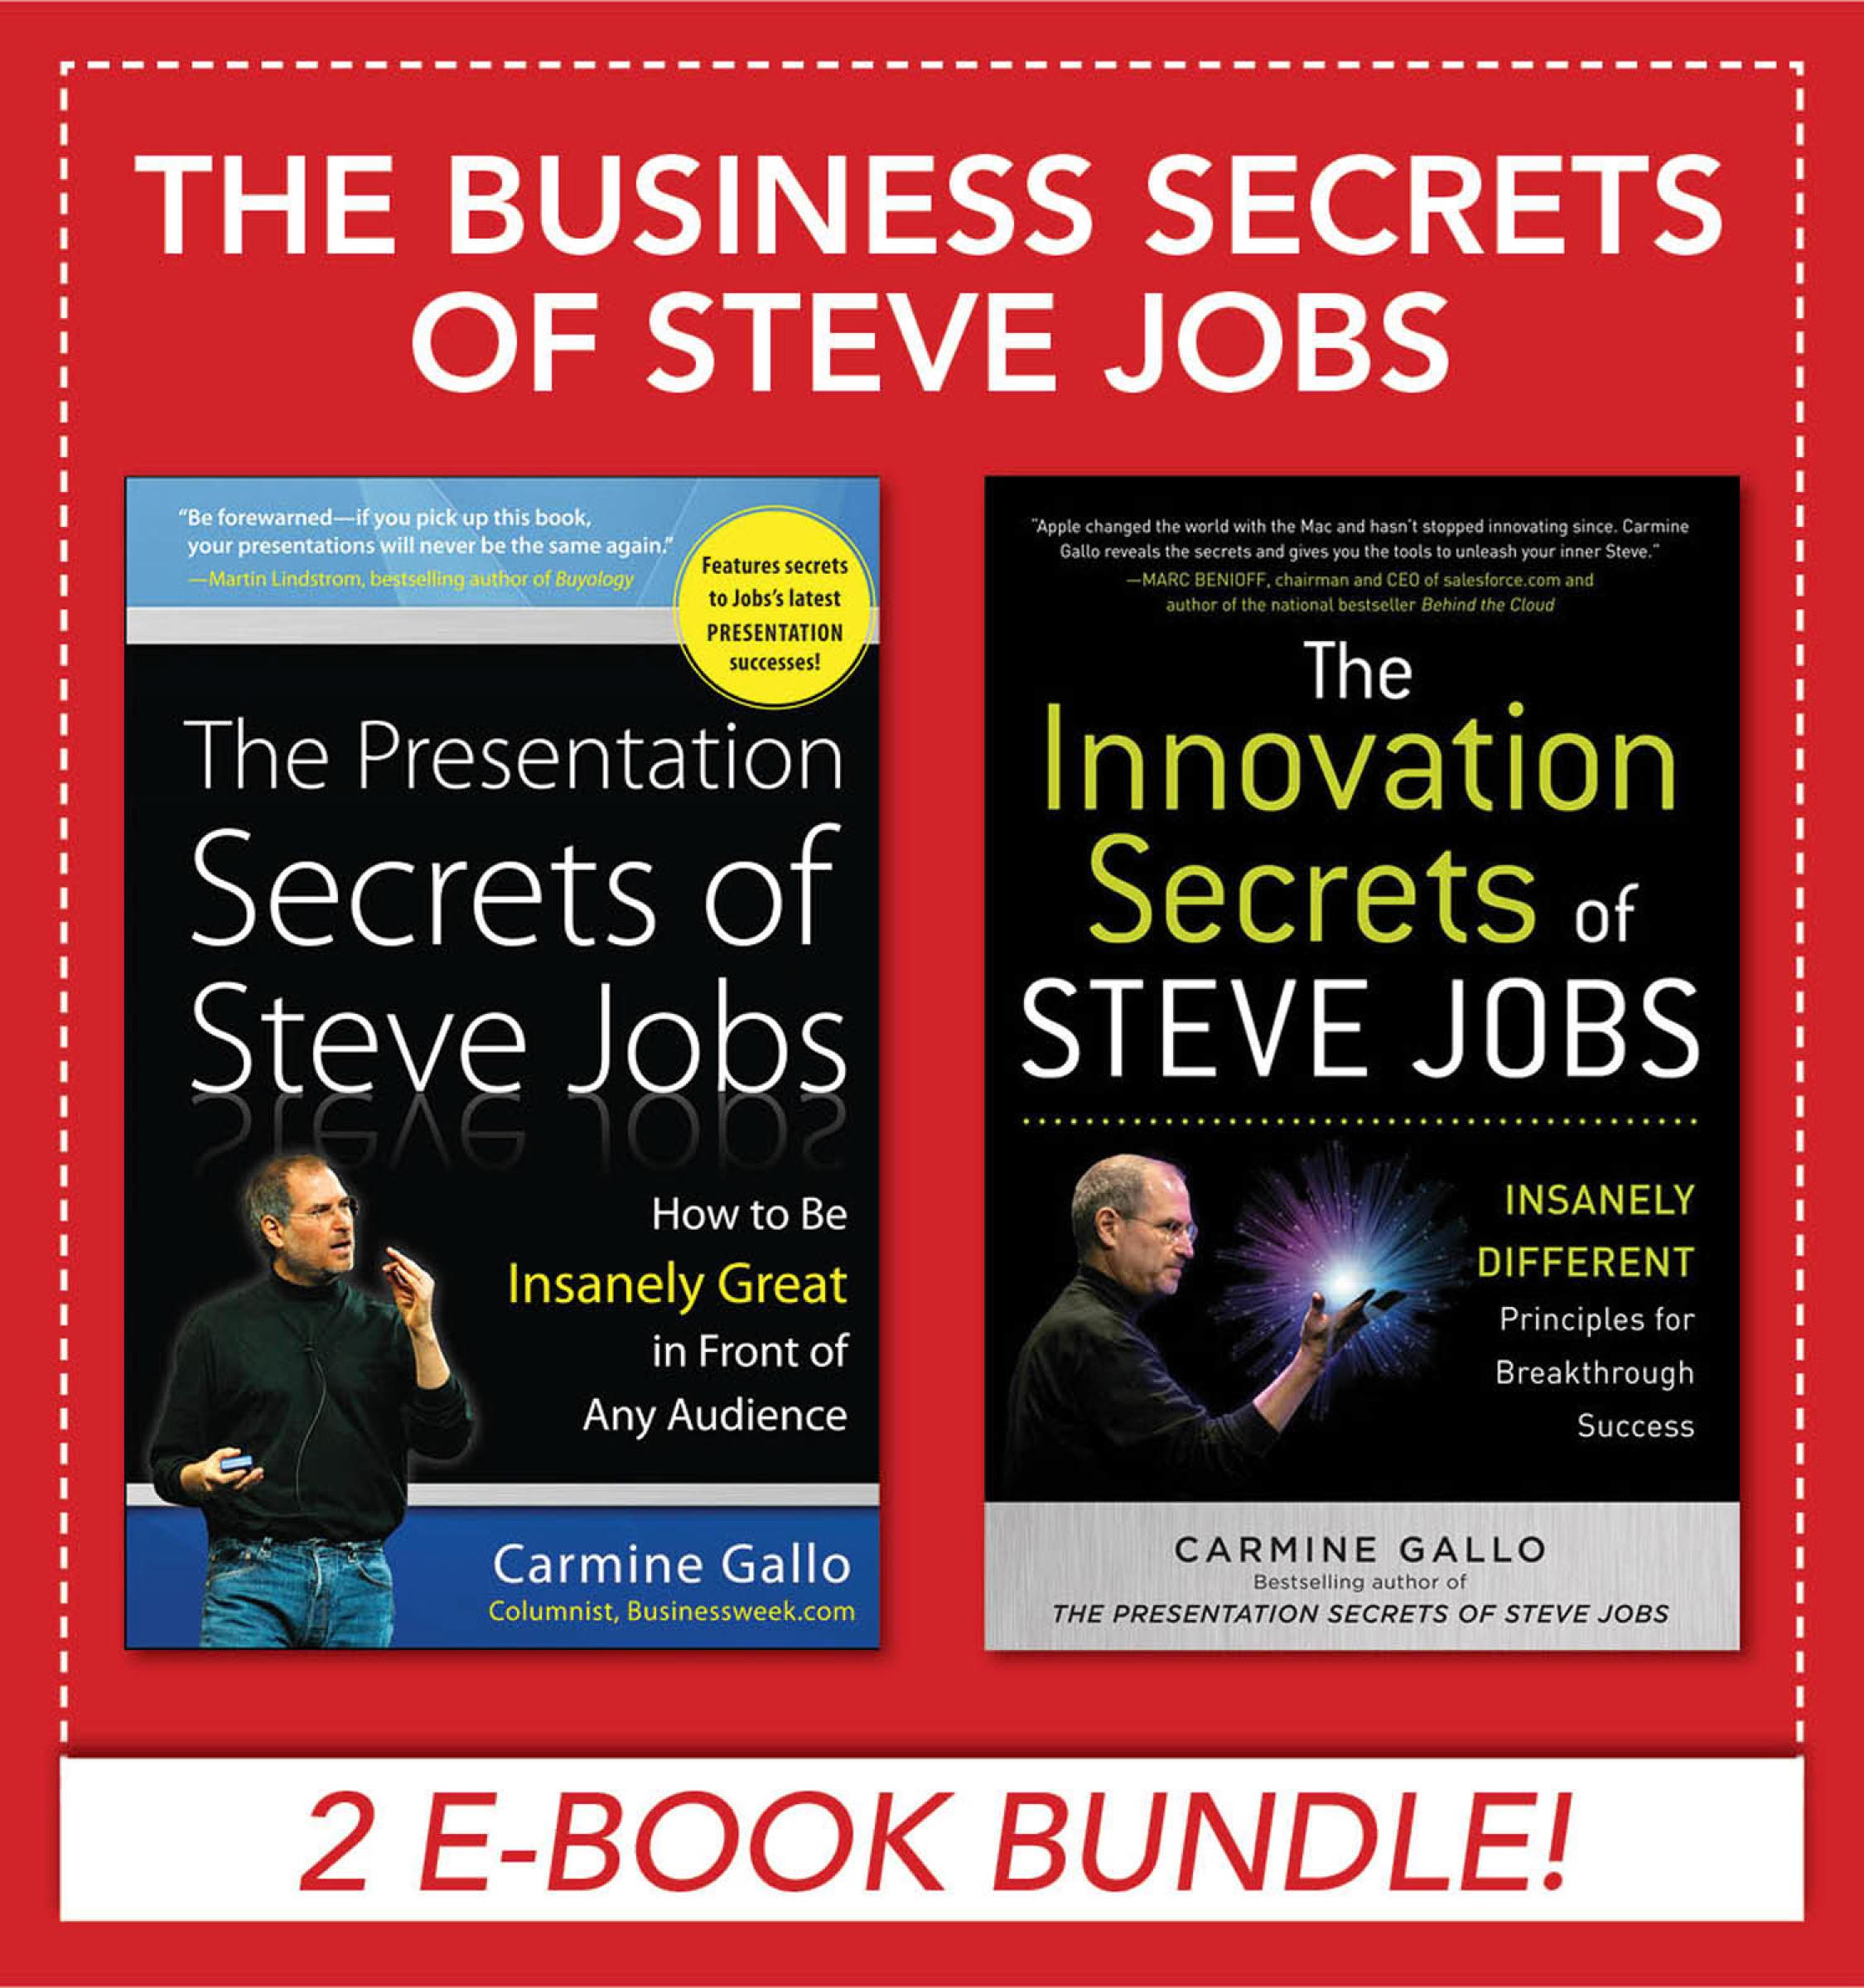 Download Ebook Business Secrets of Steve Jobs: Presentation Secrets and Innovation secrets all in one book! (EBOOK BUNDLE) by Carmine Gallo Pdf